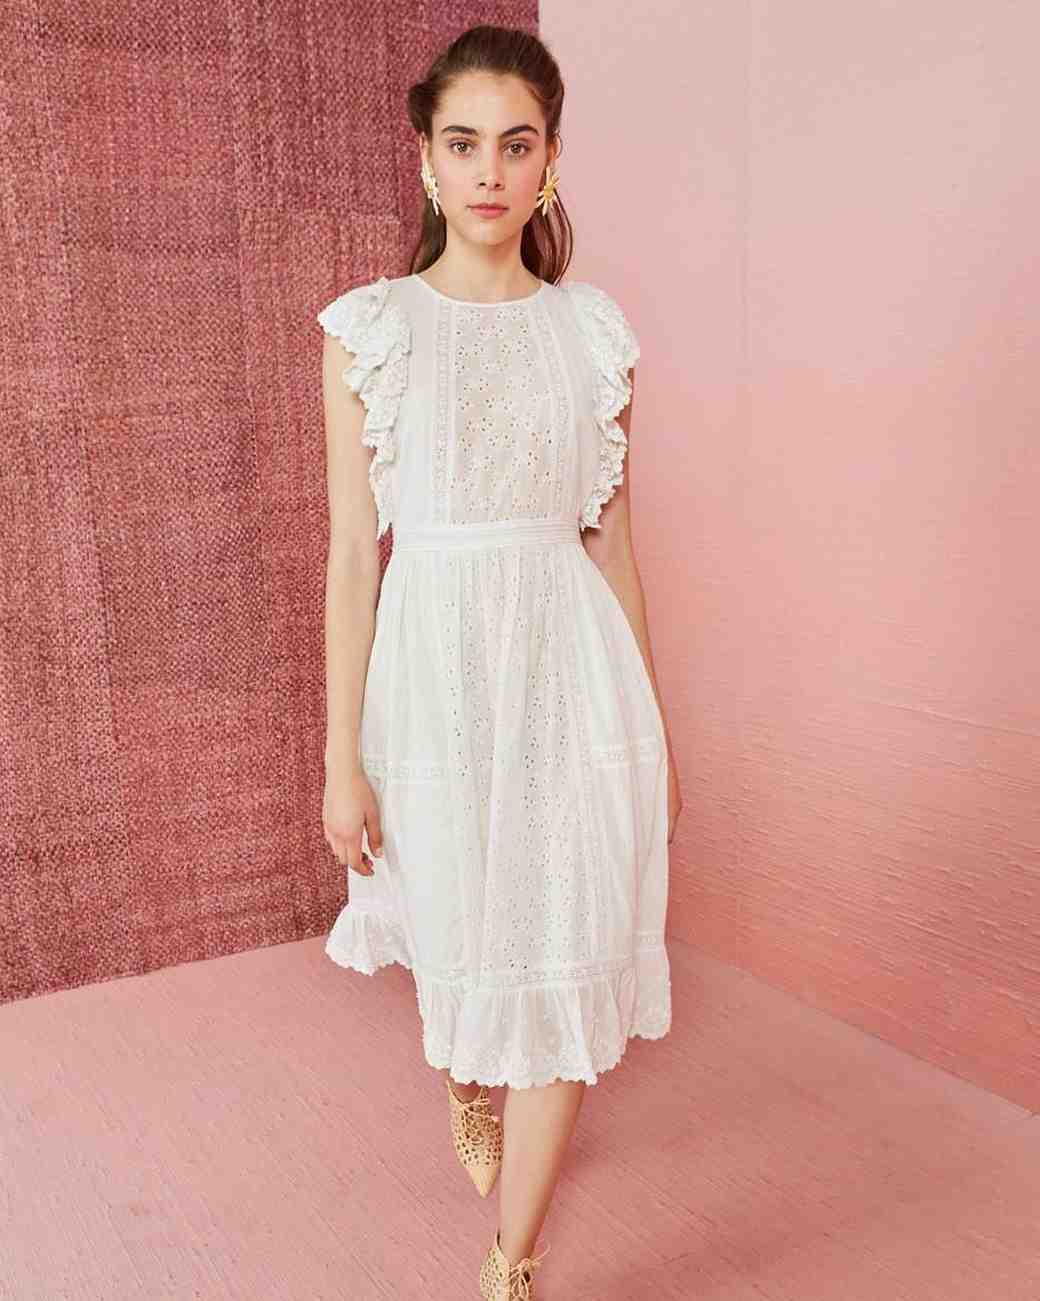 Lace Dresses For Bridal Shower